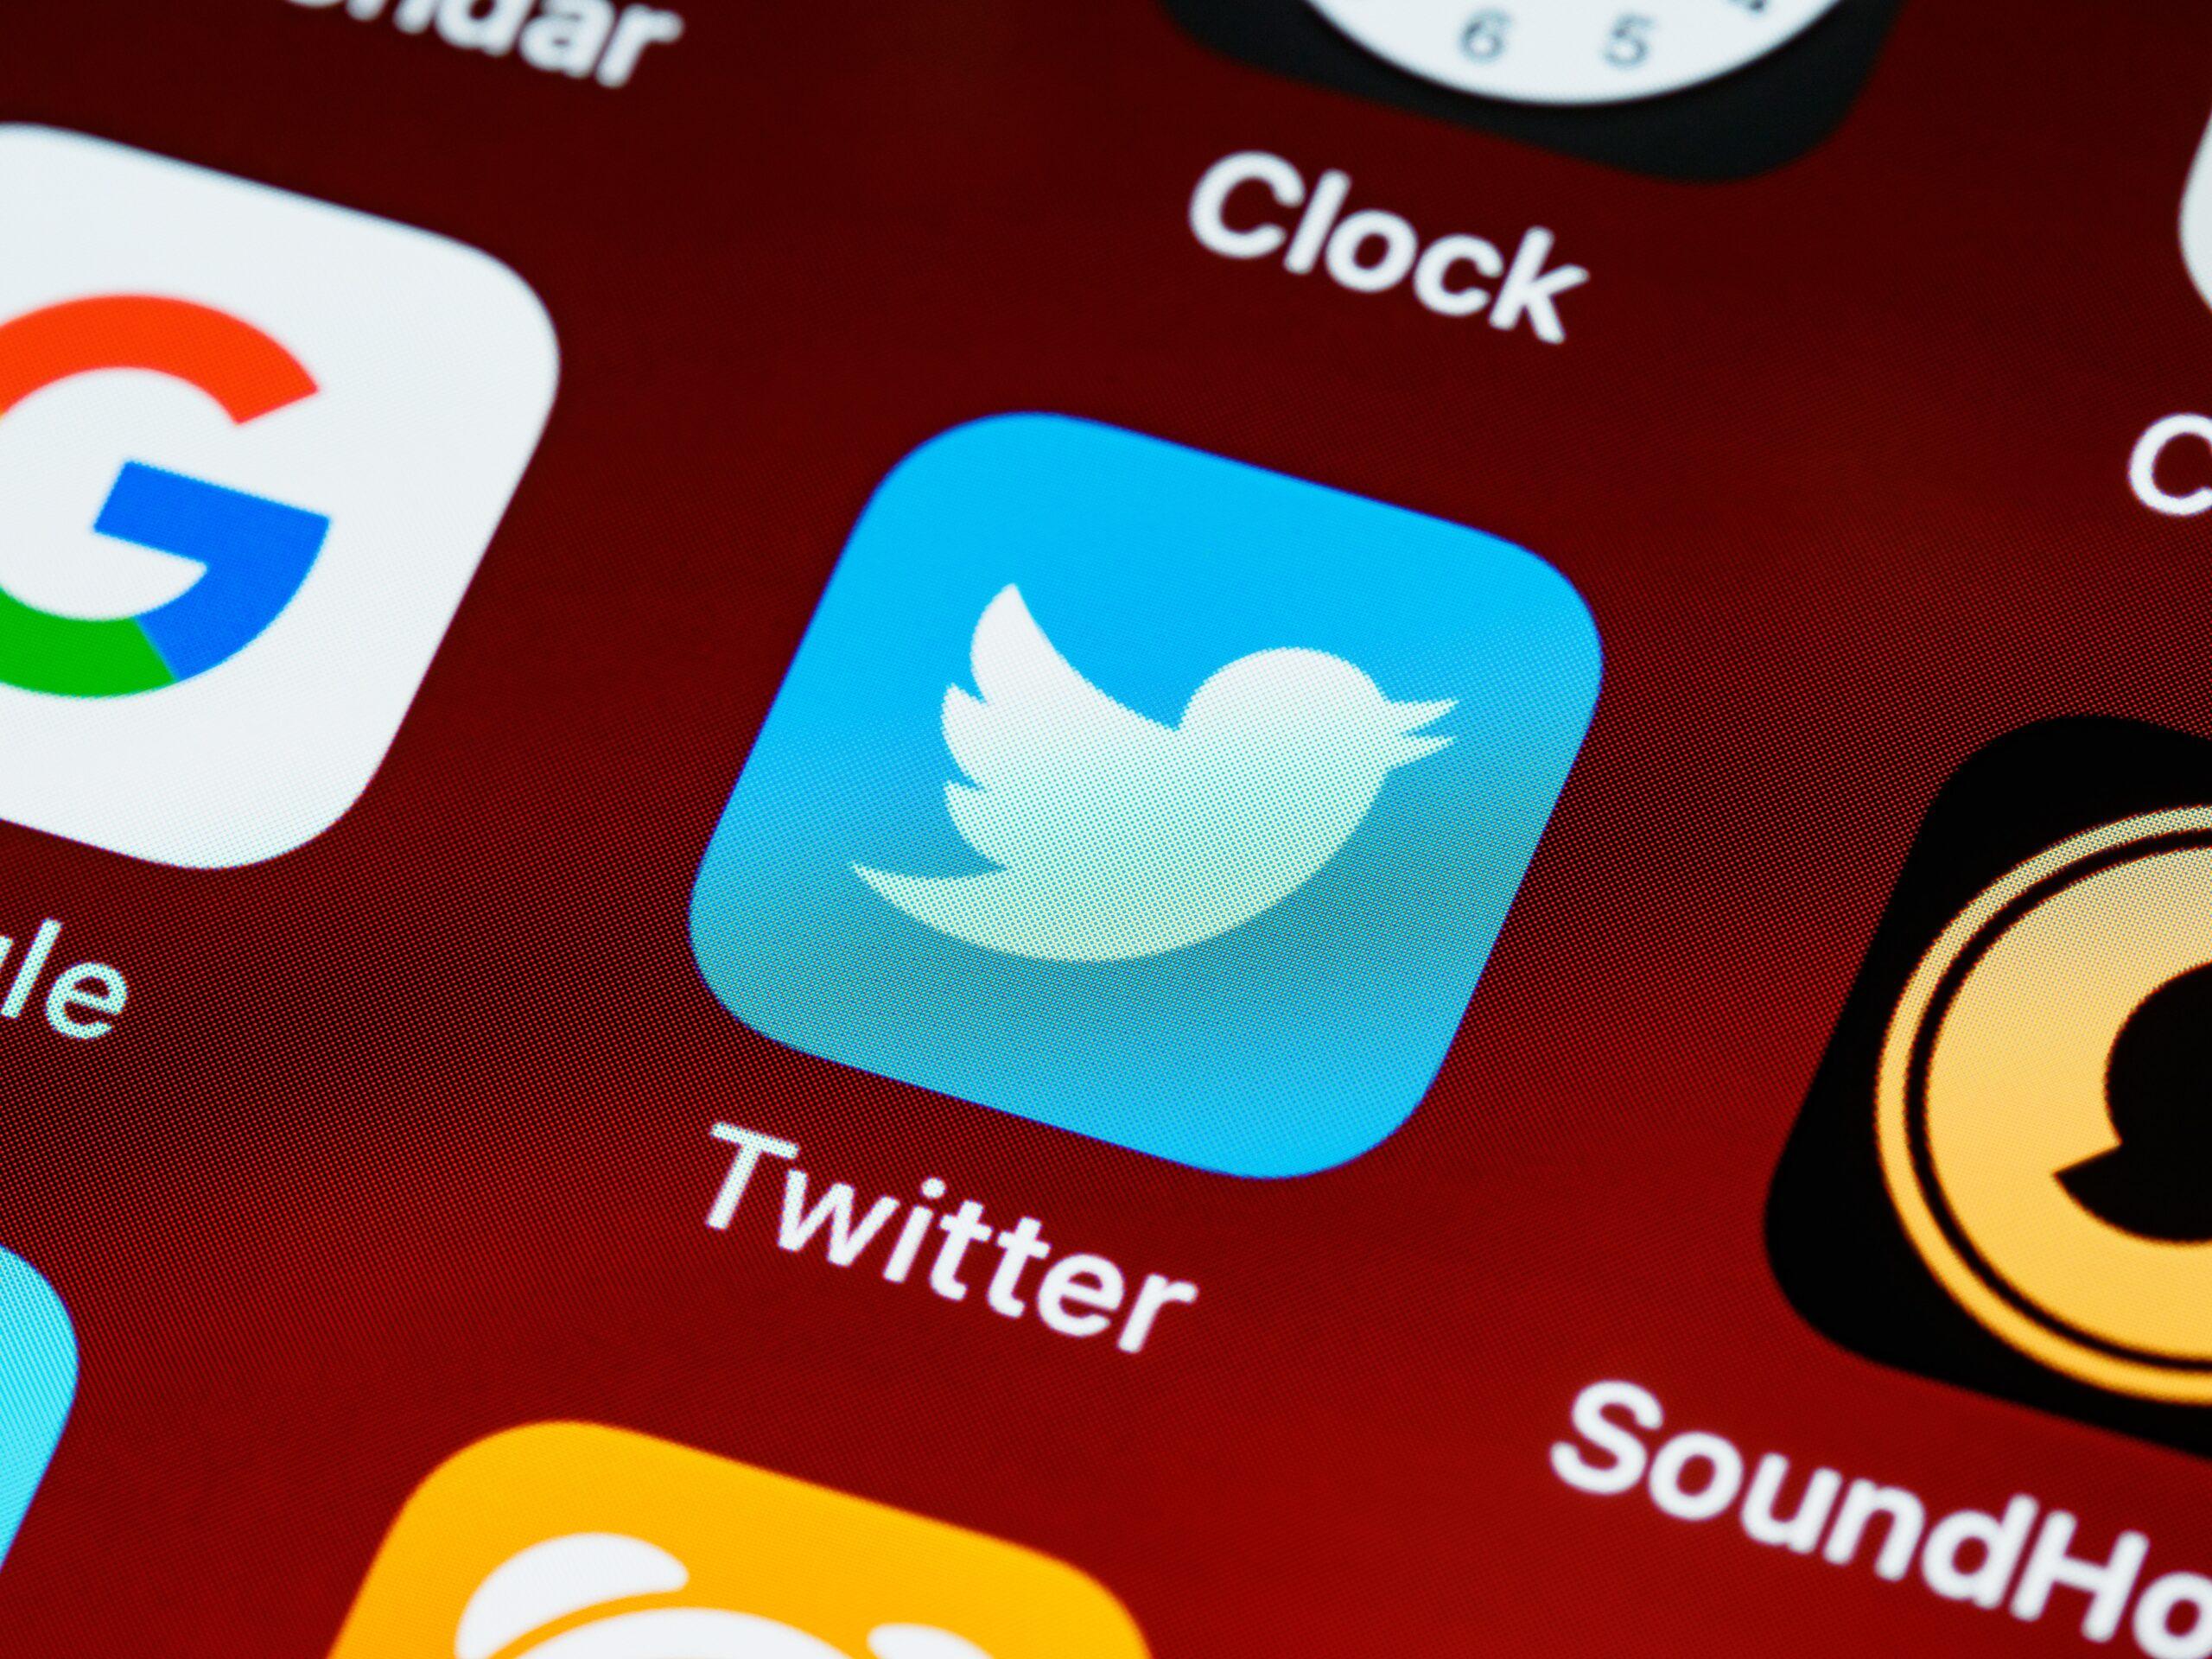 "<span class=""title"">Twitterアカウントの育て方④ FF比率の調整法</span>"